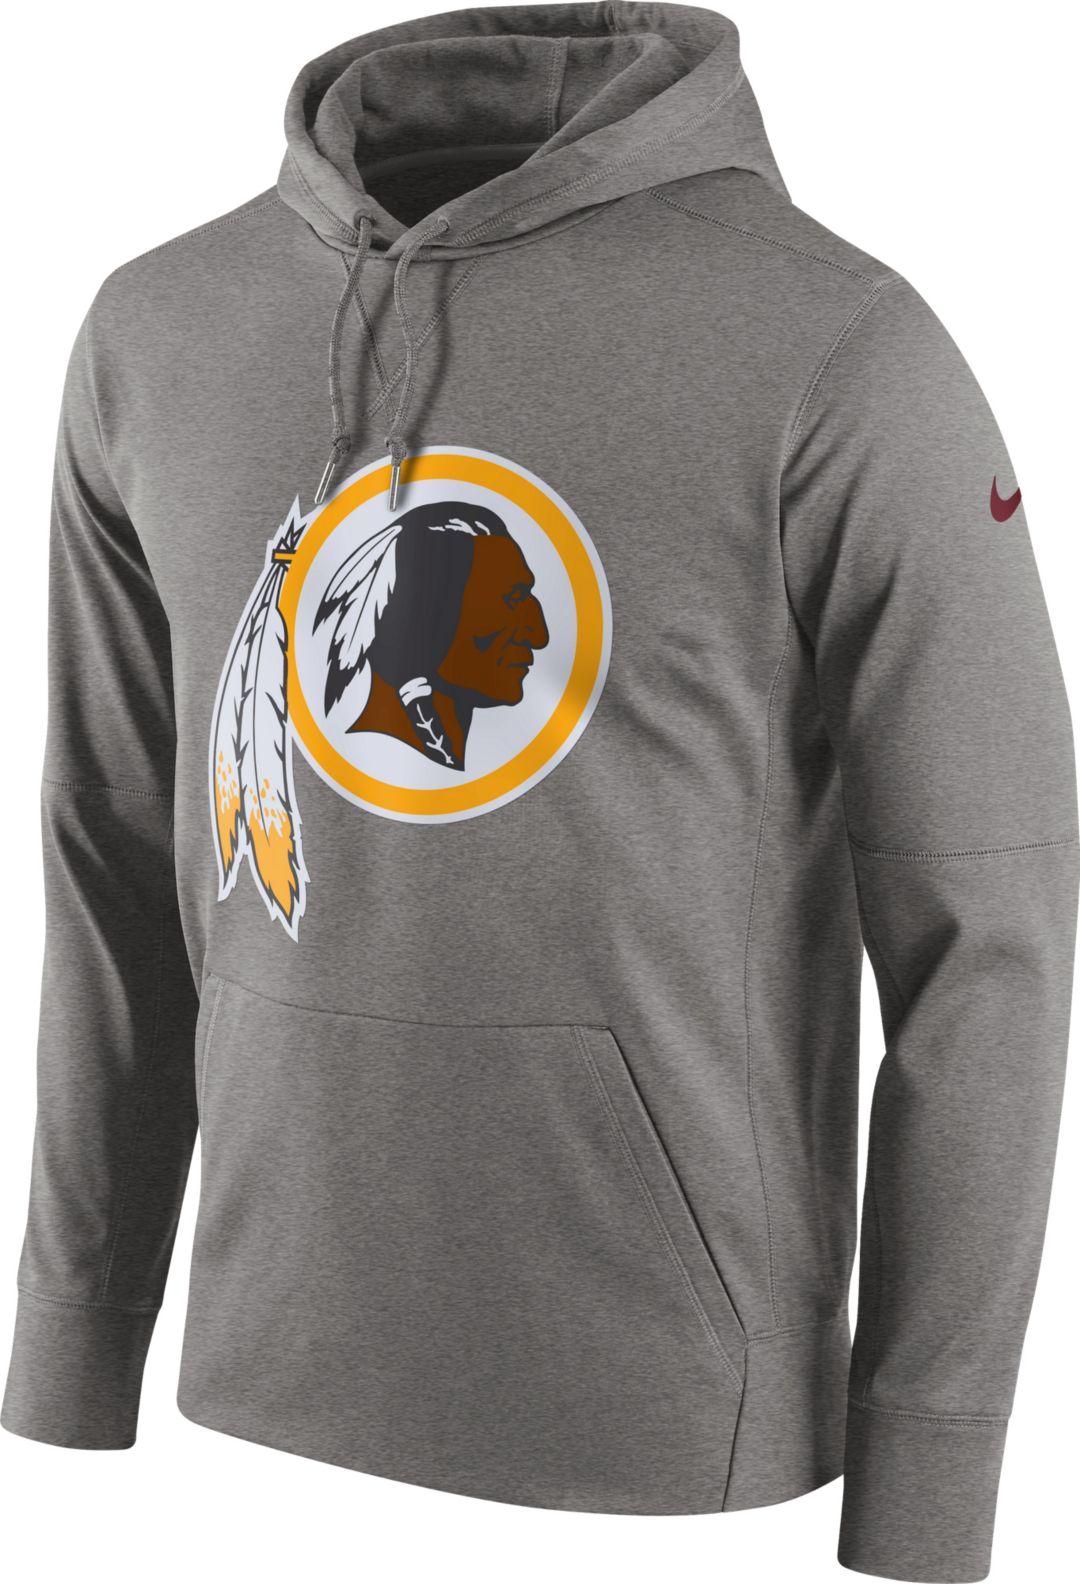 ef15c7bc Nike Men's Washington Redskins Performance Circuit Logo Essential Grey  Hoodie